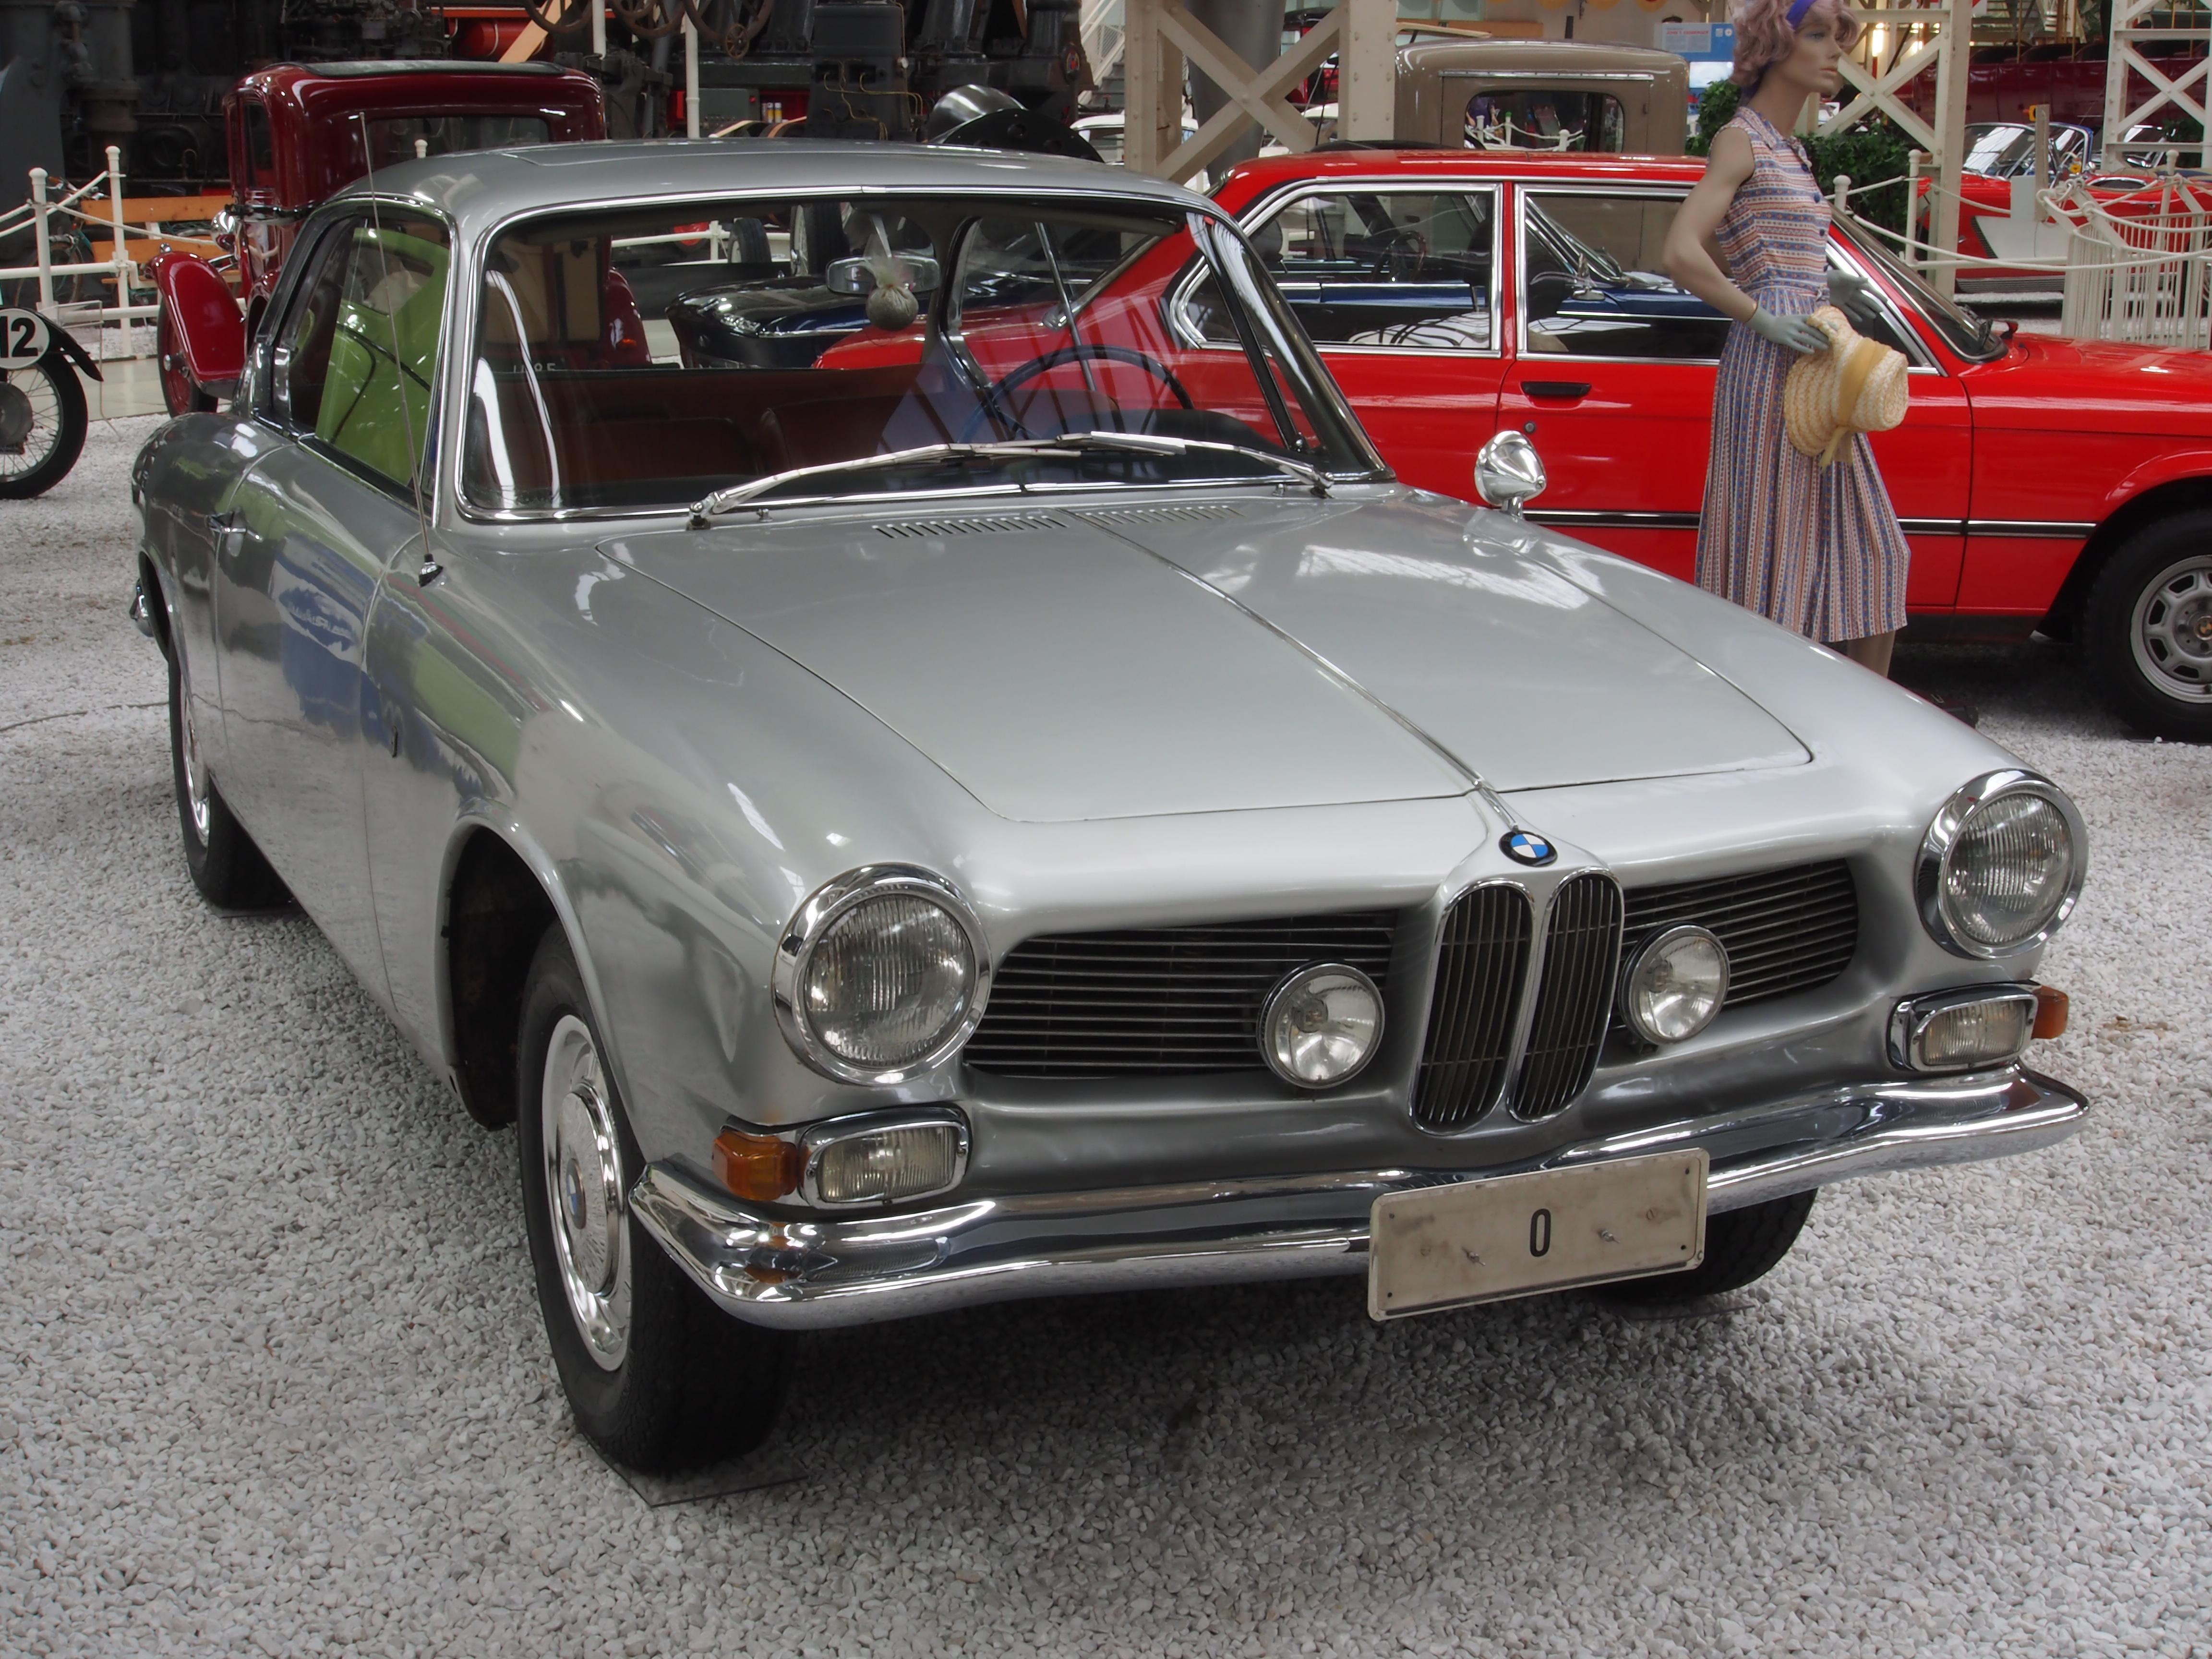 File:Silver BMW 3200 CS.JPG - Wikimedia Commons